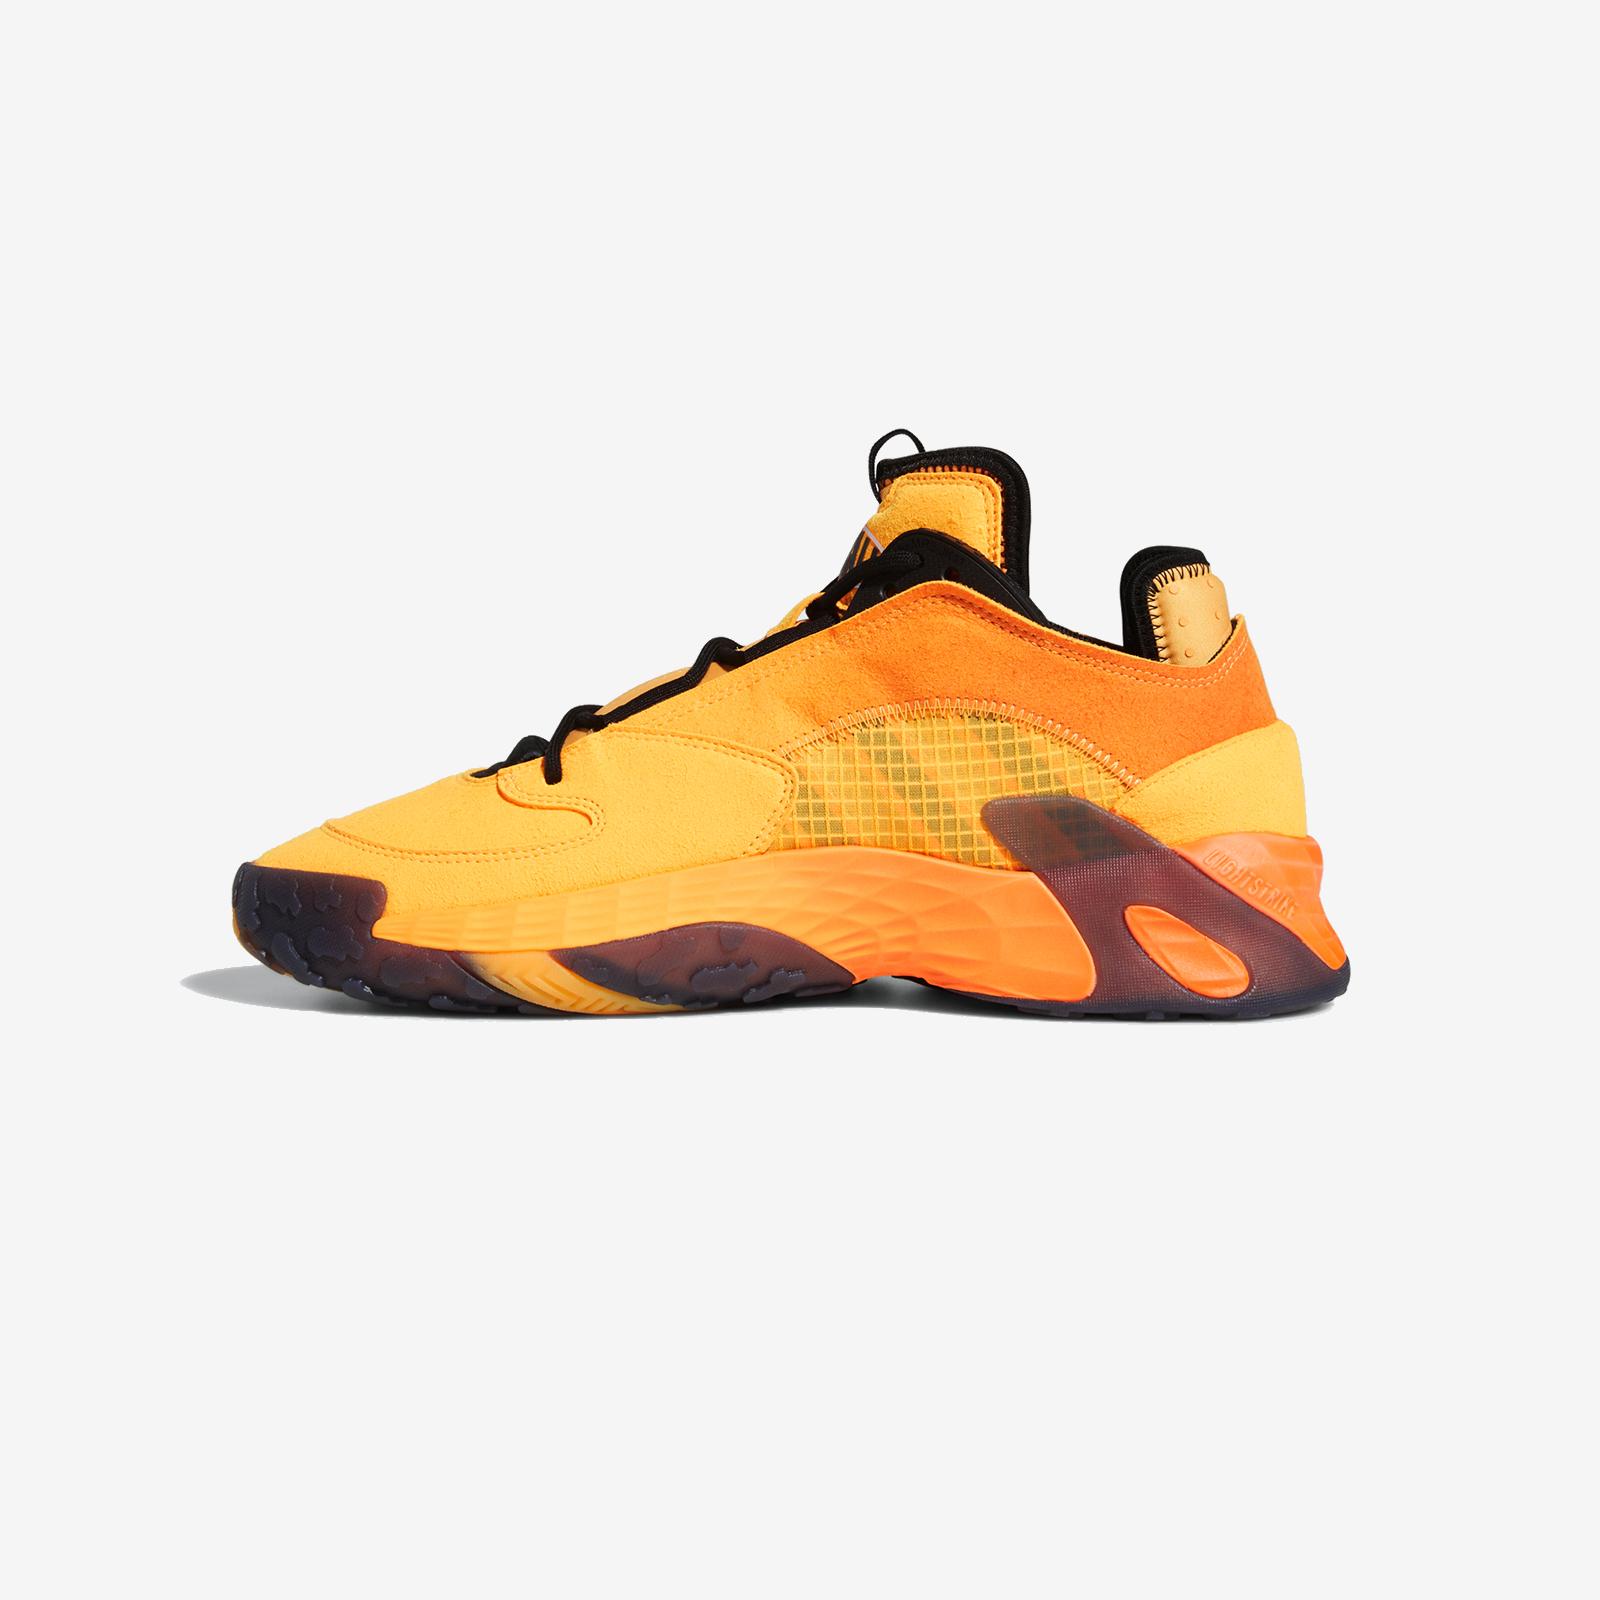 adidas streetball 95 for sale